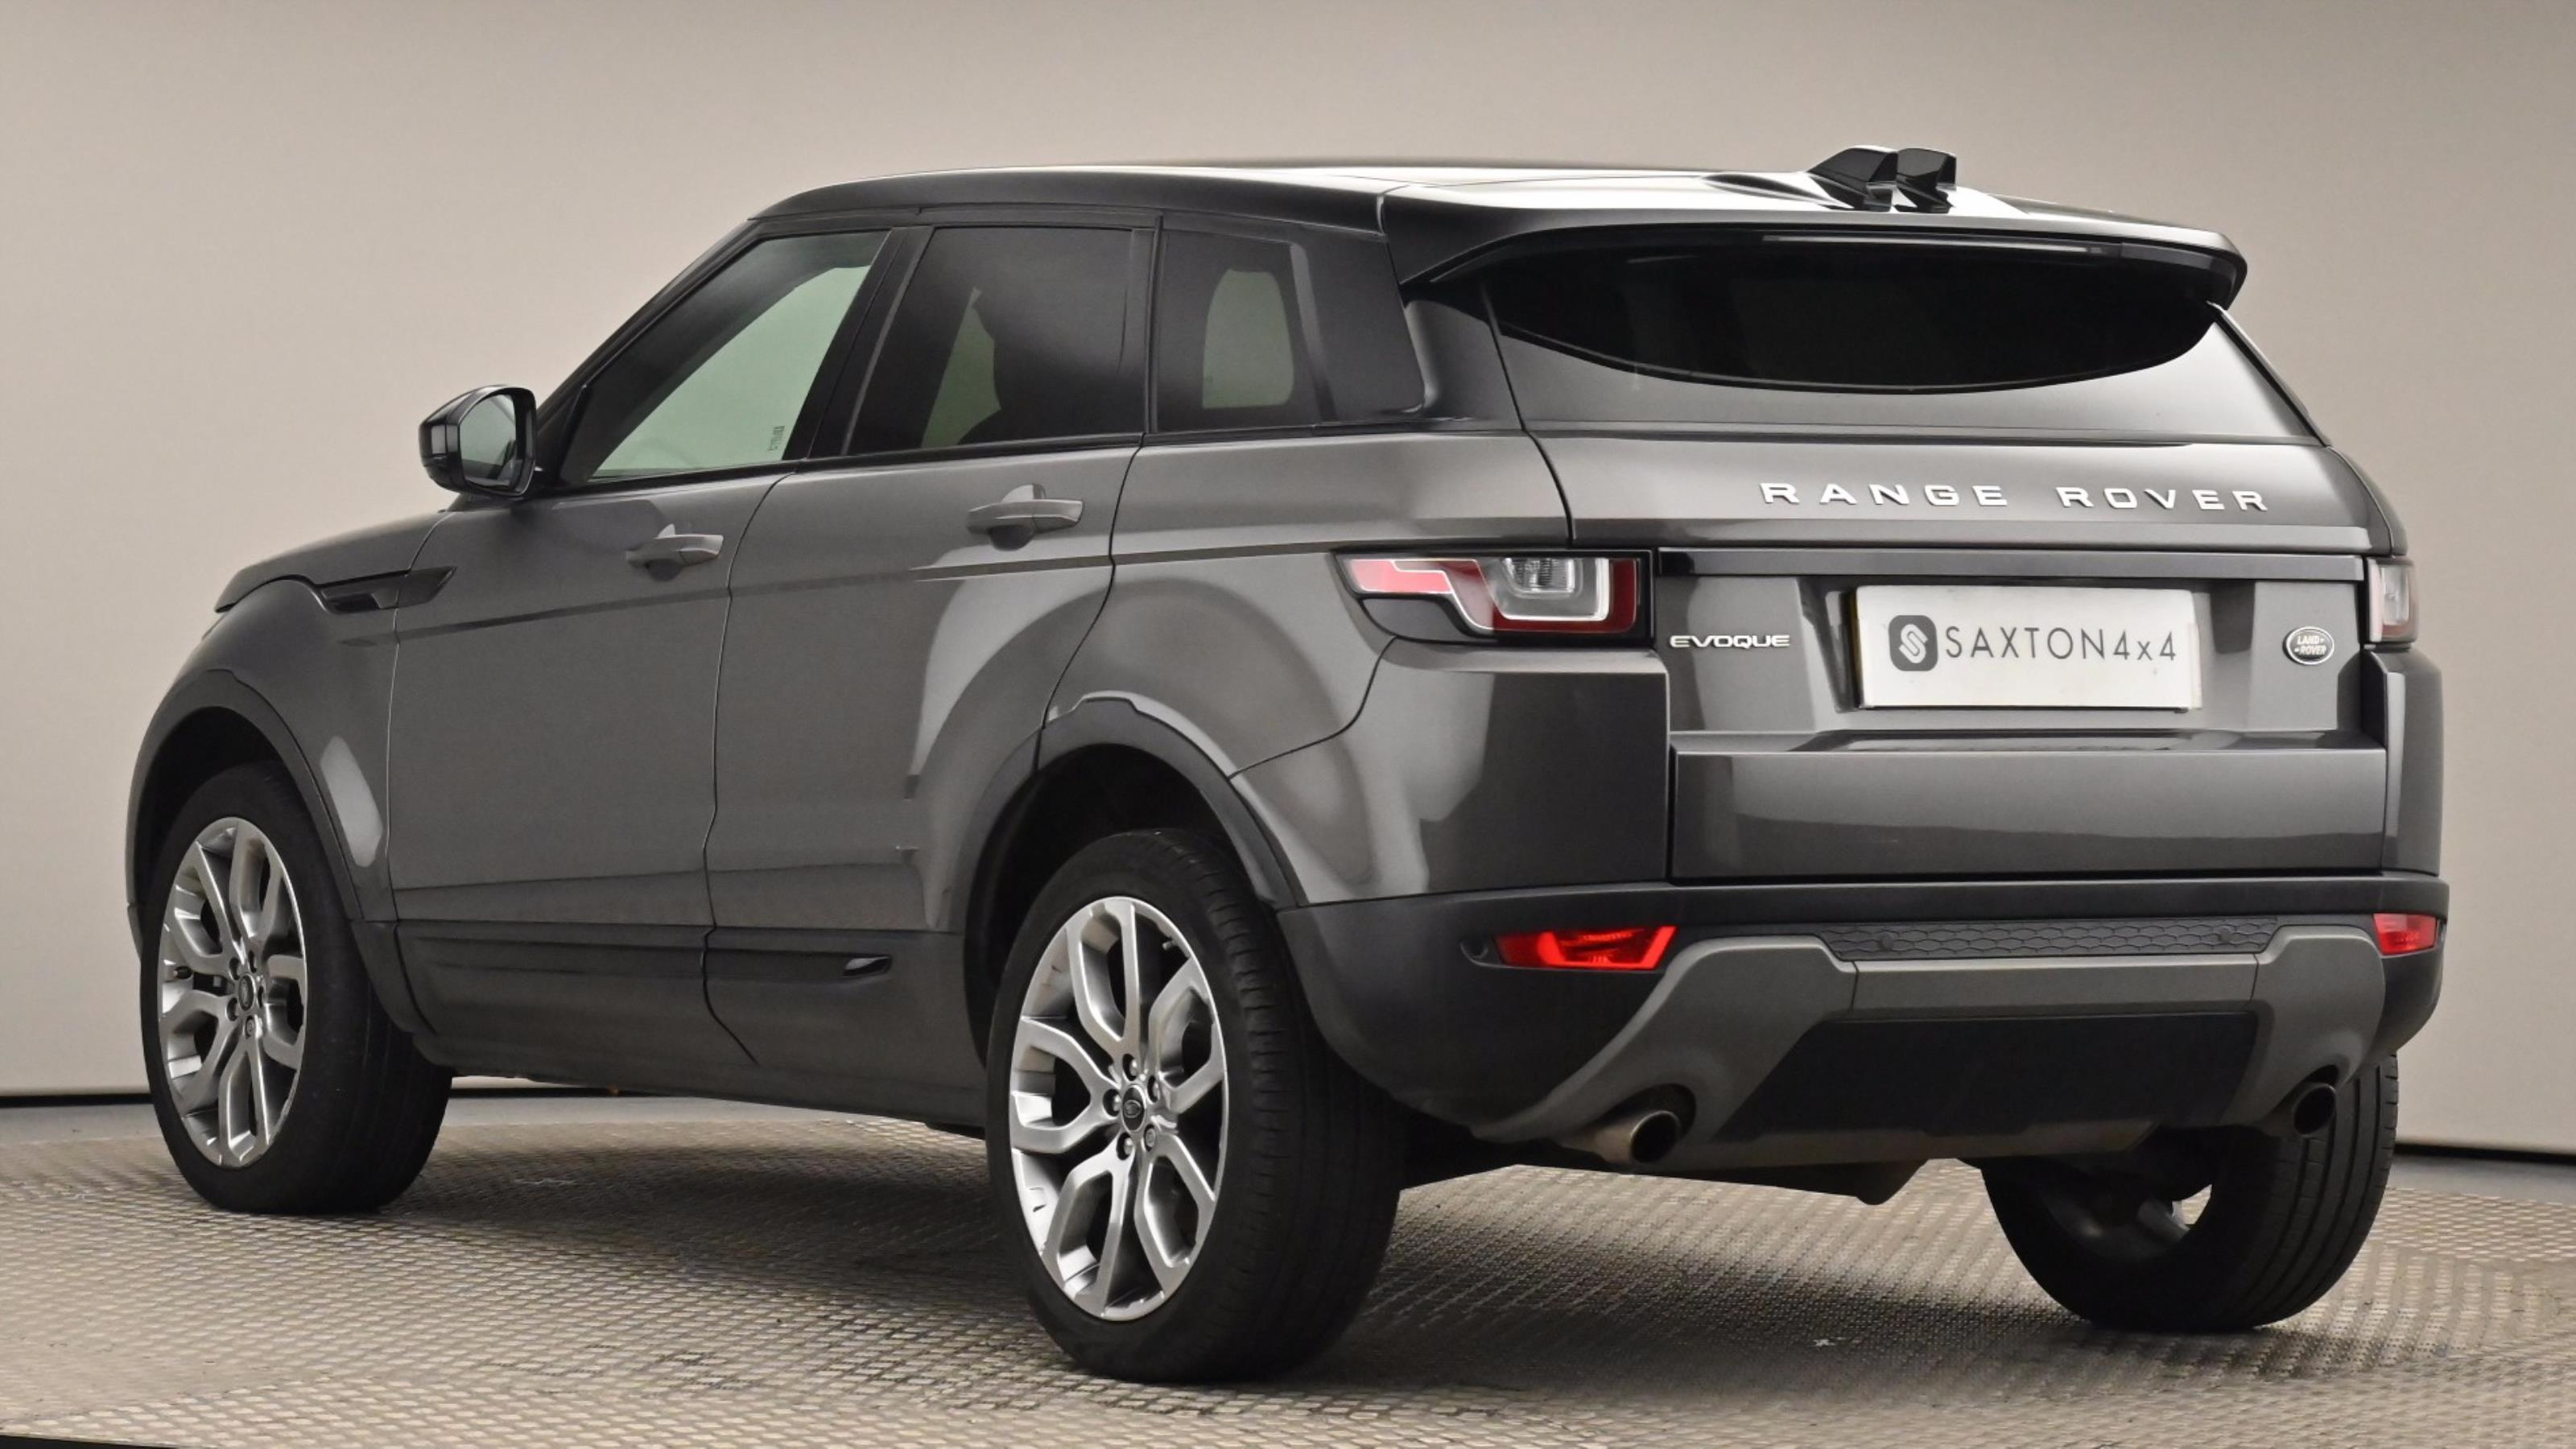 Used 2016 Land Rover RANGE ROVER EVOQUE 2.0 TD4 SE Tech 5dr Auto GREY at Saxton4x4